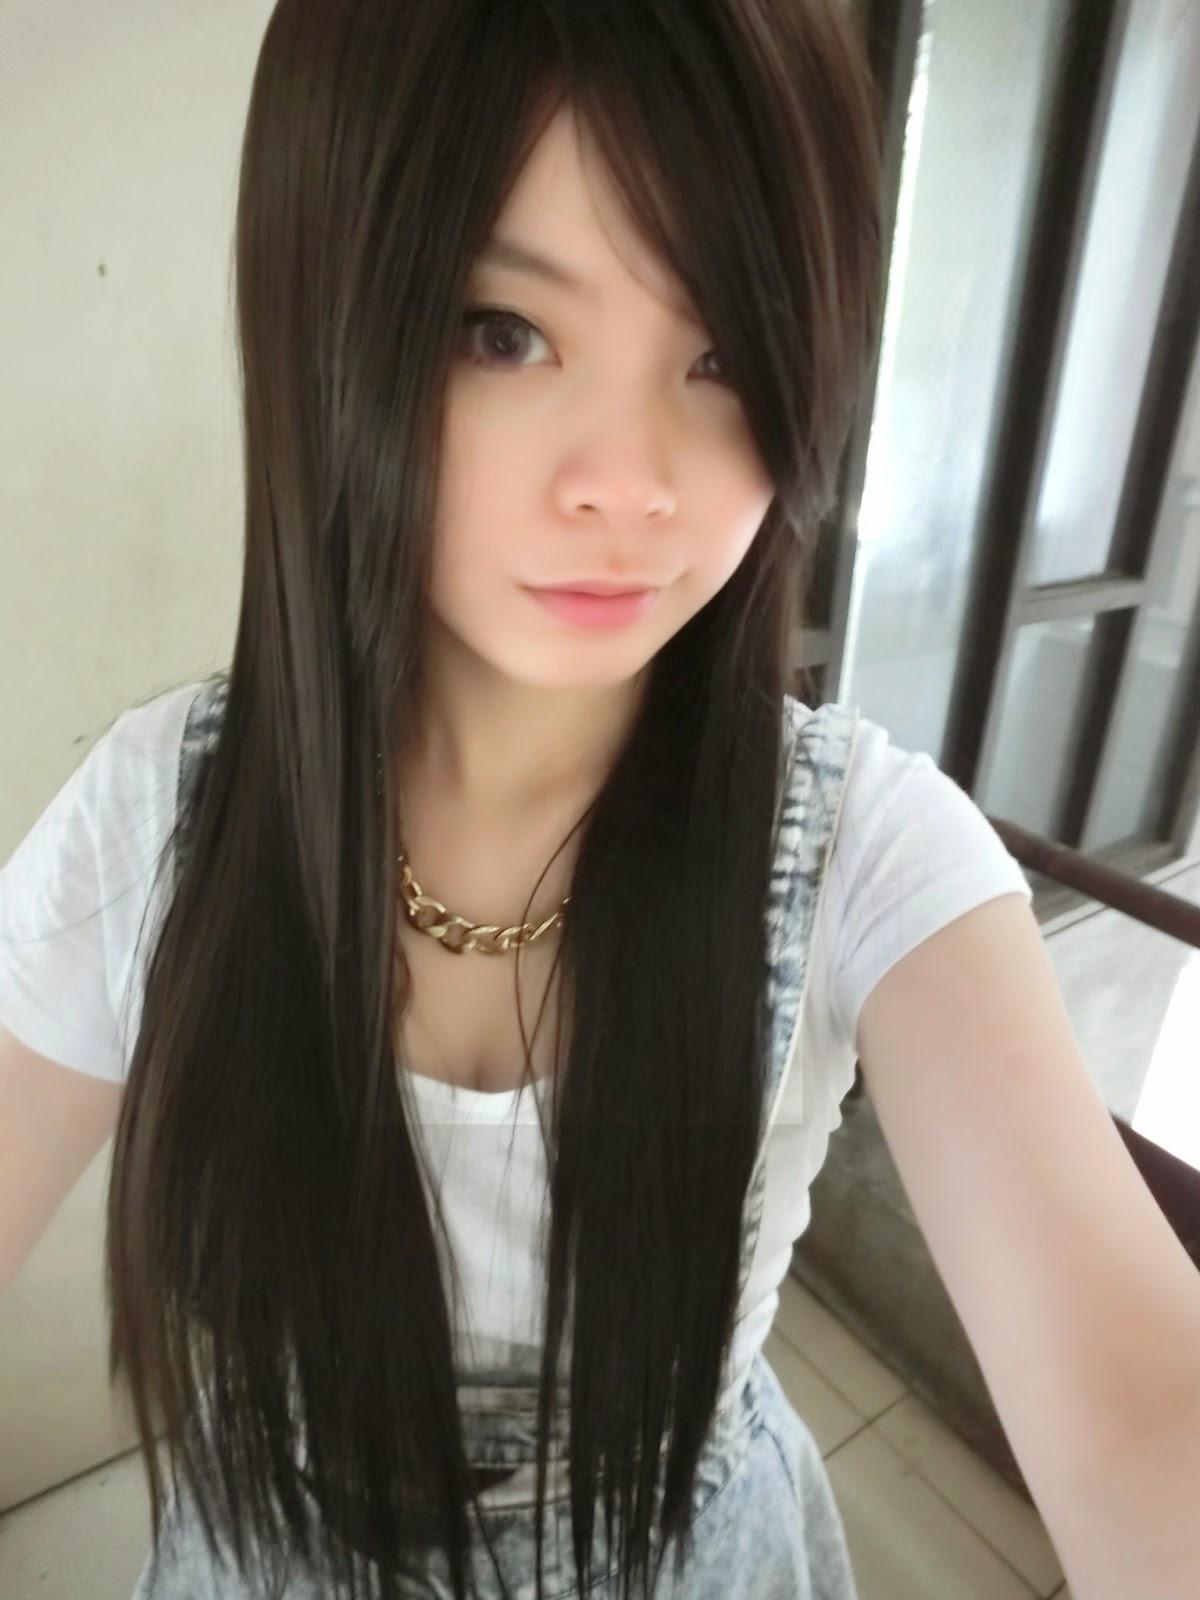 http://4.bp.blogspot.com/-JzfBgRBNQVY/UzHY59guM_I/AAAAAAAAR40/itzeONXb07M/s1600/CIMG0224+girlhairdo+wig.JPG